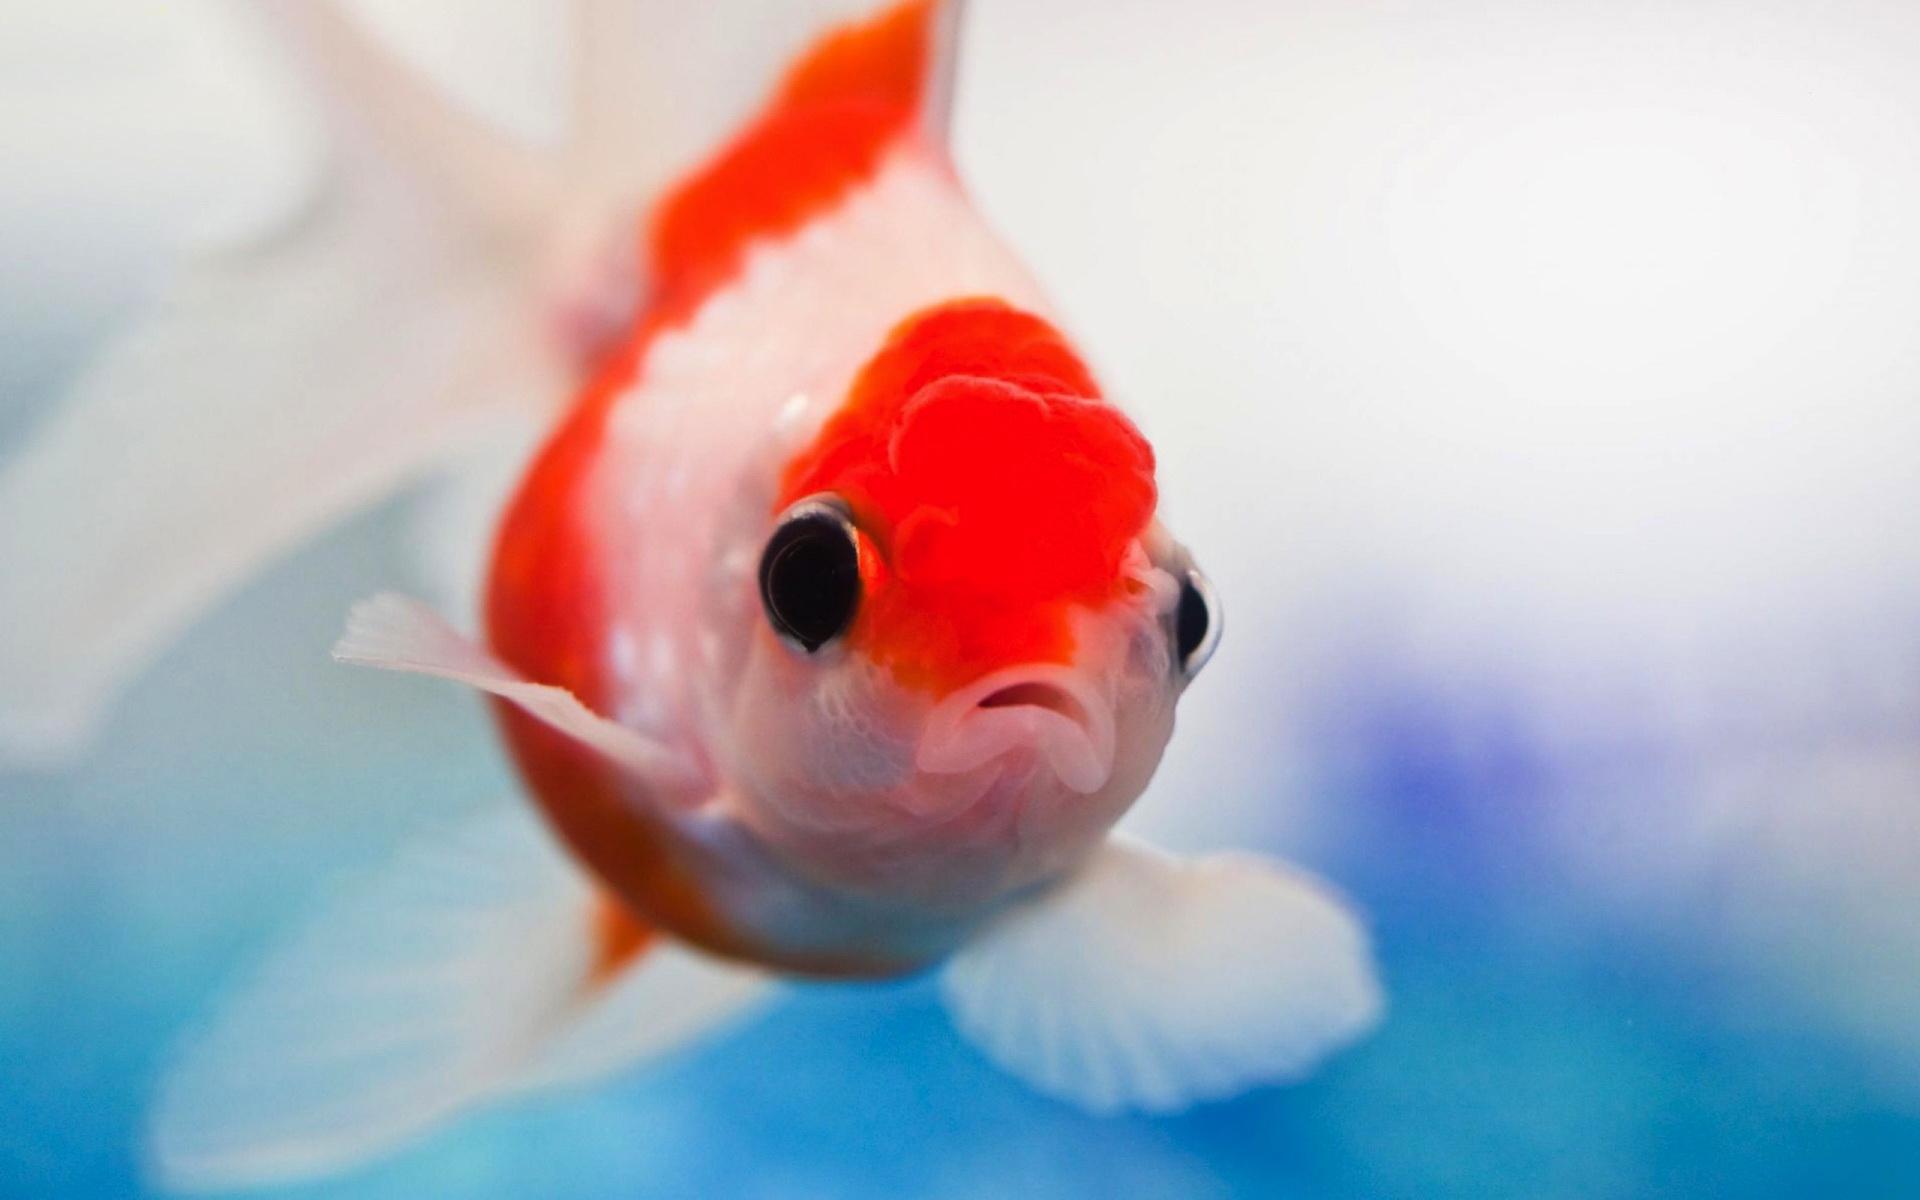 Pug Iphone Wallpaper Lionhead Goldfish Full Hd Wallpaper And Background Image